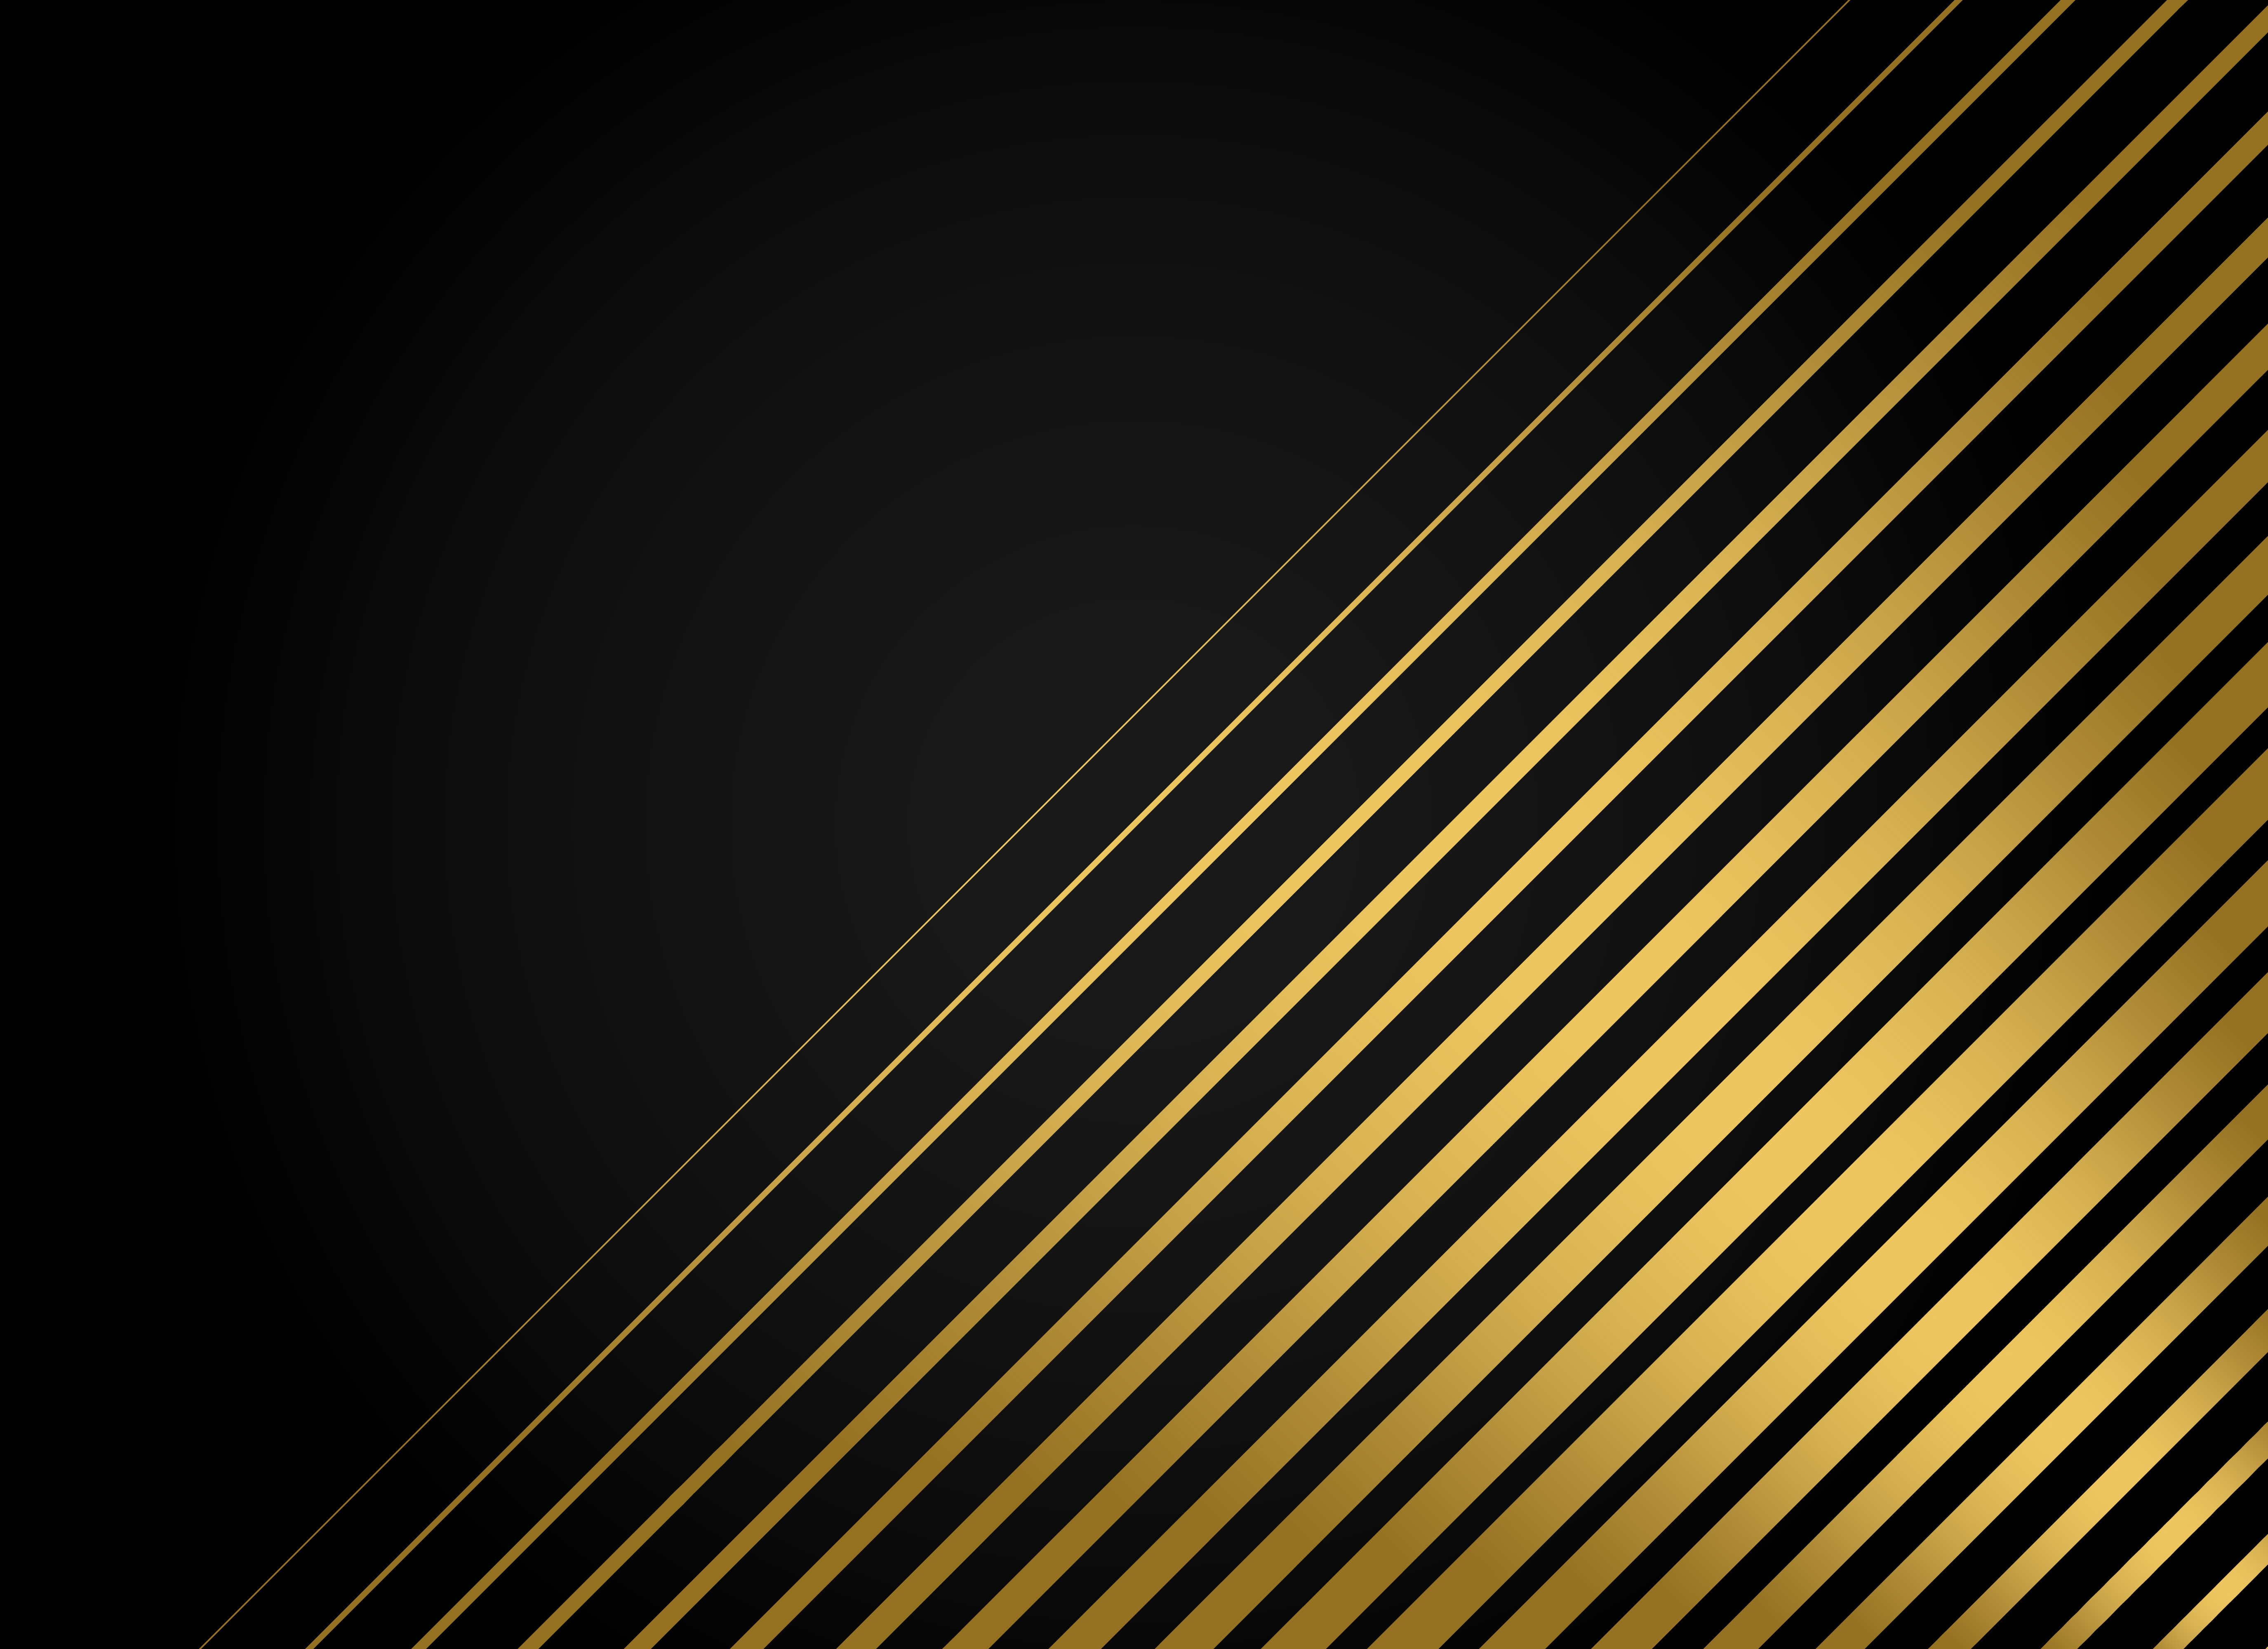 Free Vector Photoshop Stripe Patterns